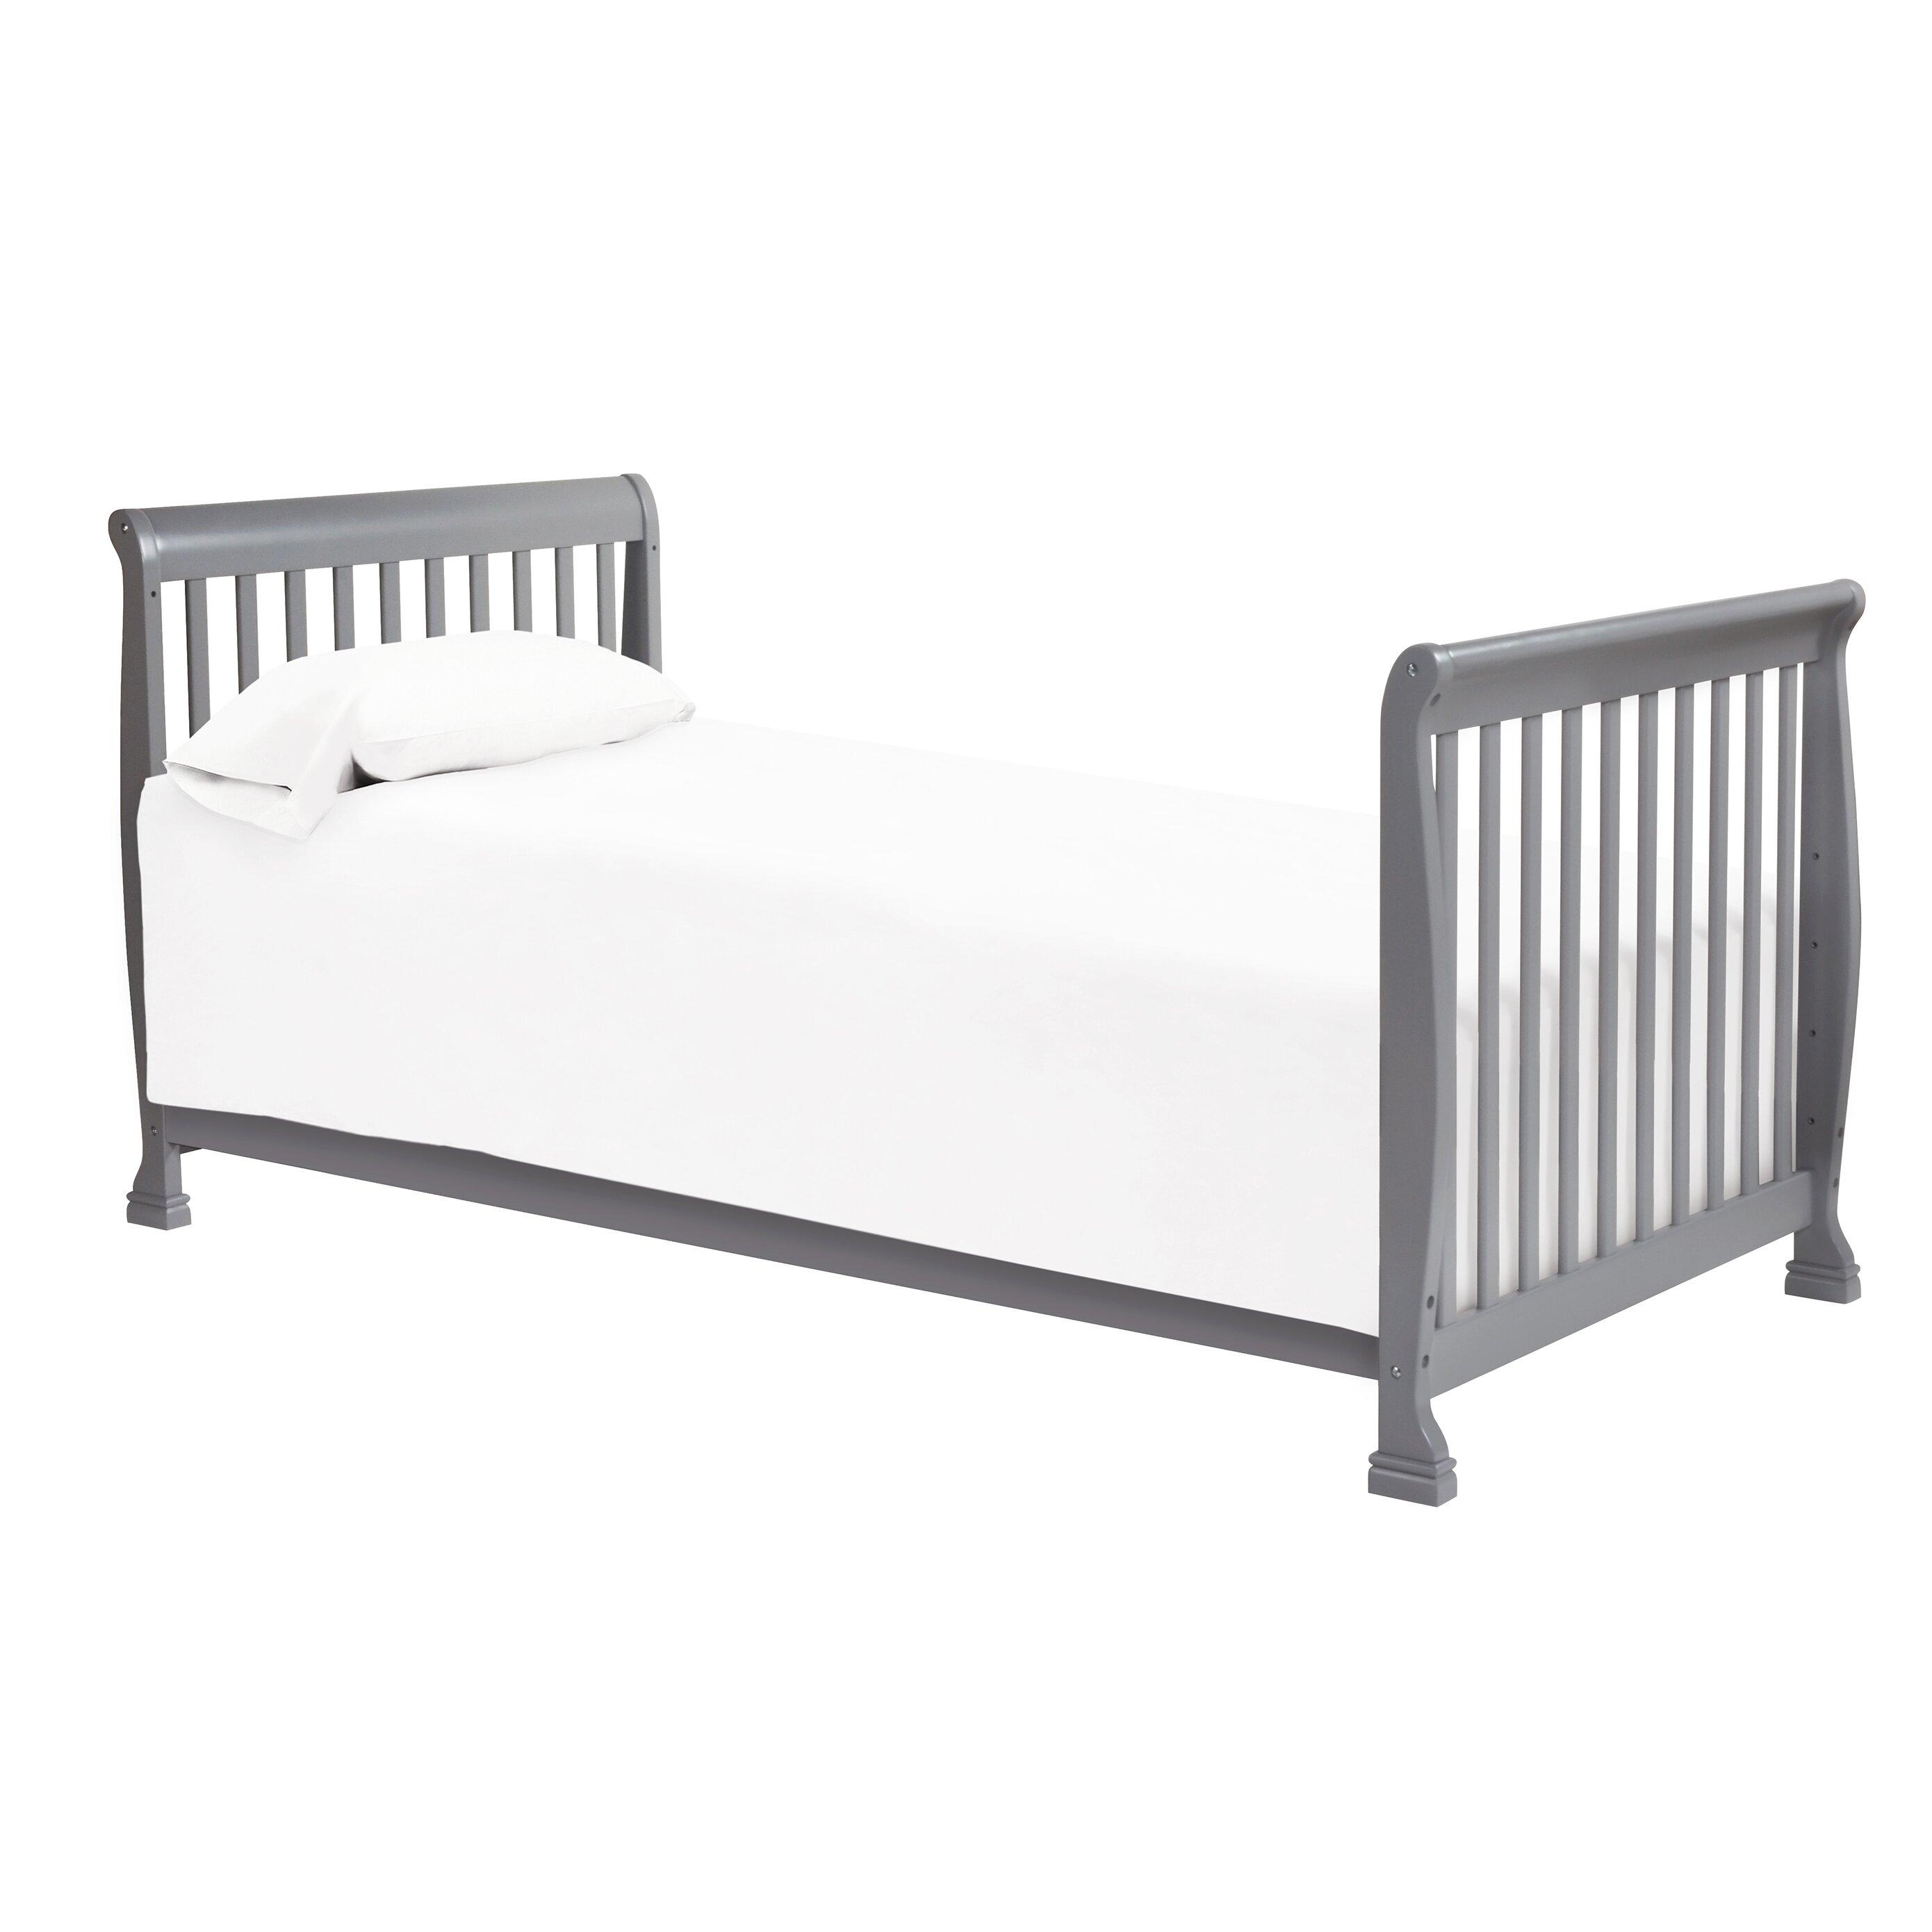 Evacuation crib for sale - Davinci Kalani 2 In 1 Convertible Mini Crib